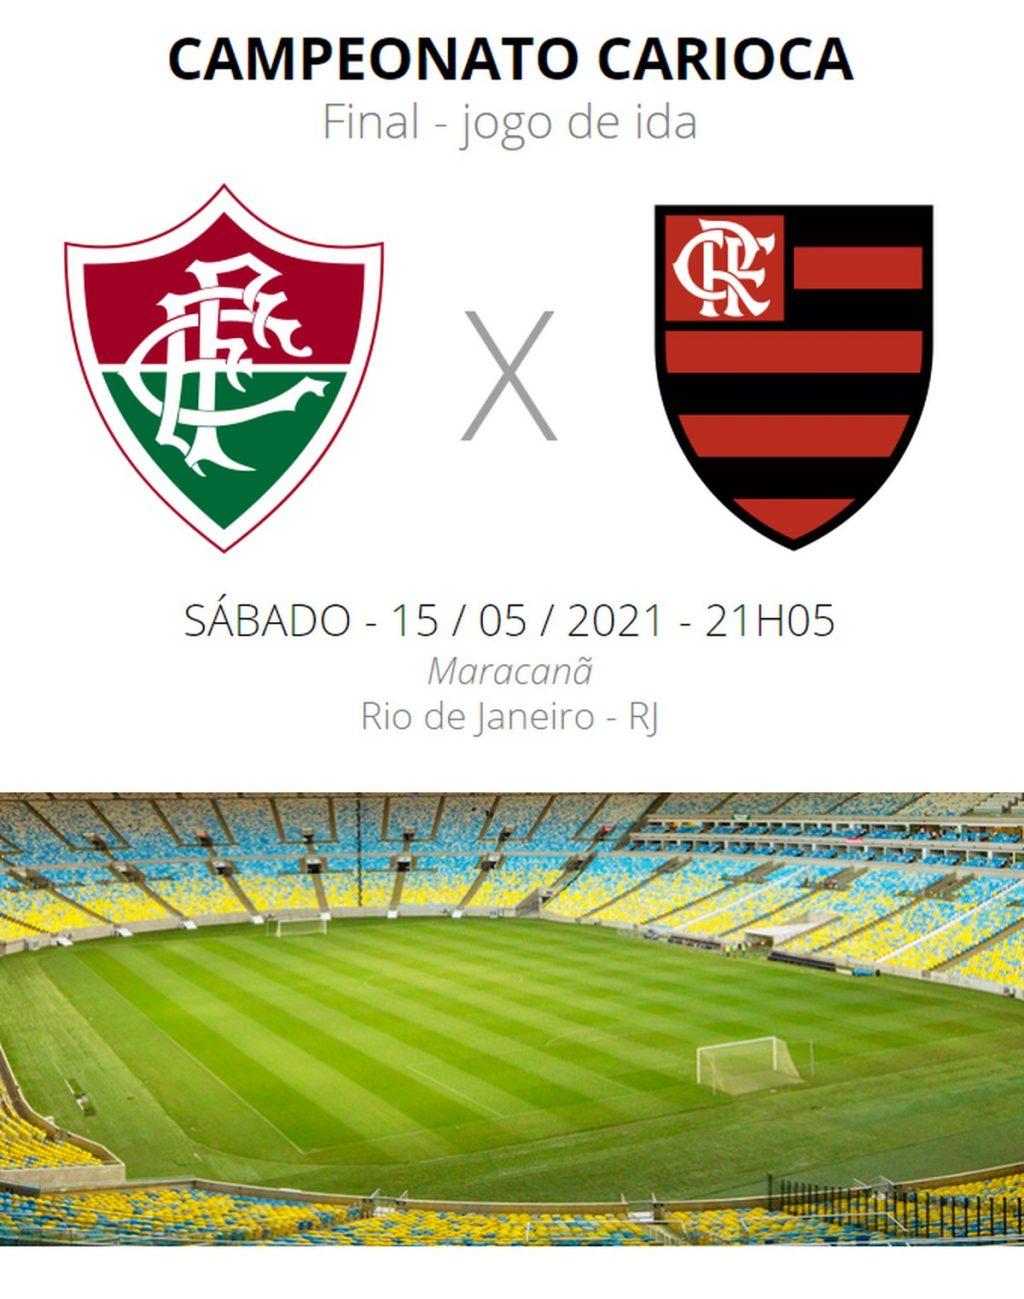 Fluminense vs. Flamengo: See Lineups, Absences and Final Referees  Carioca championship